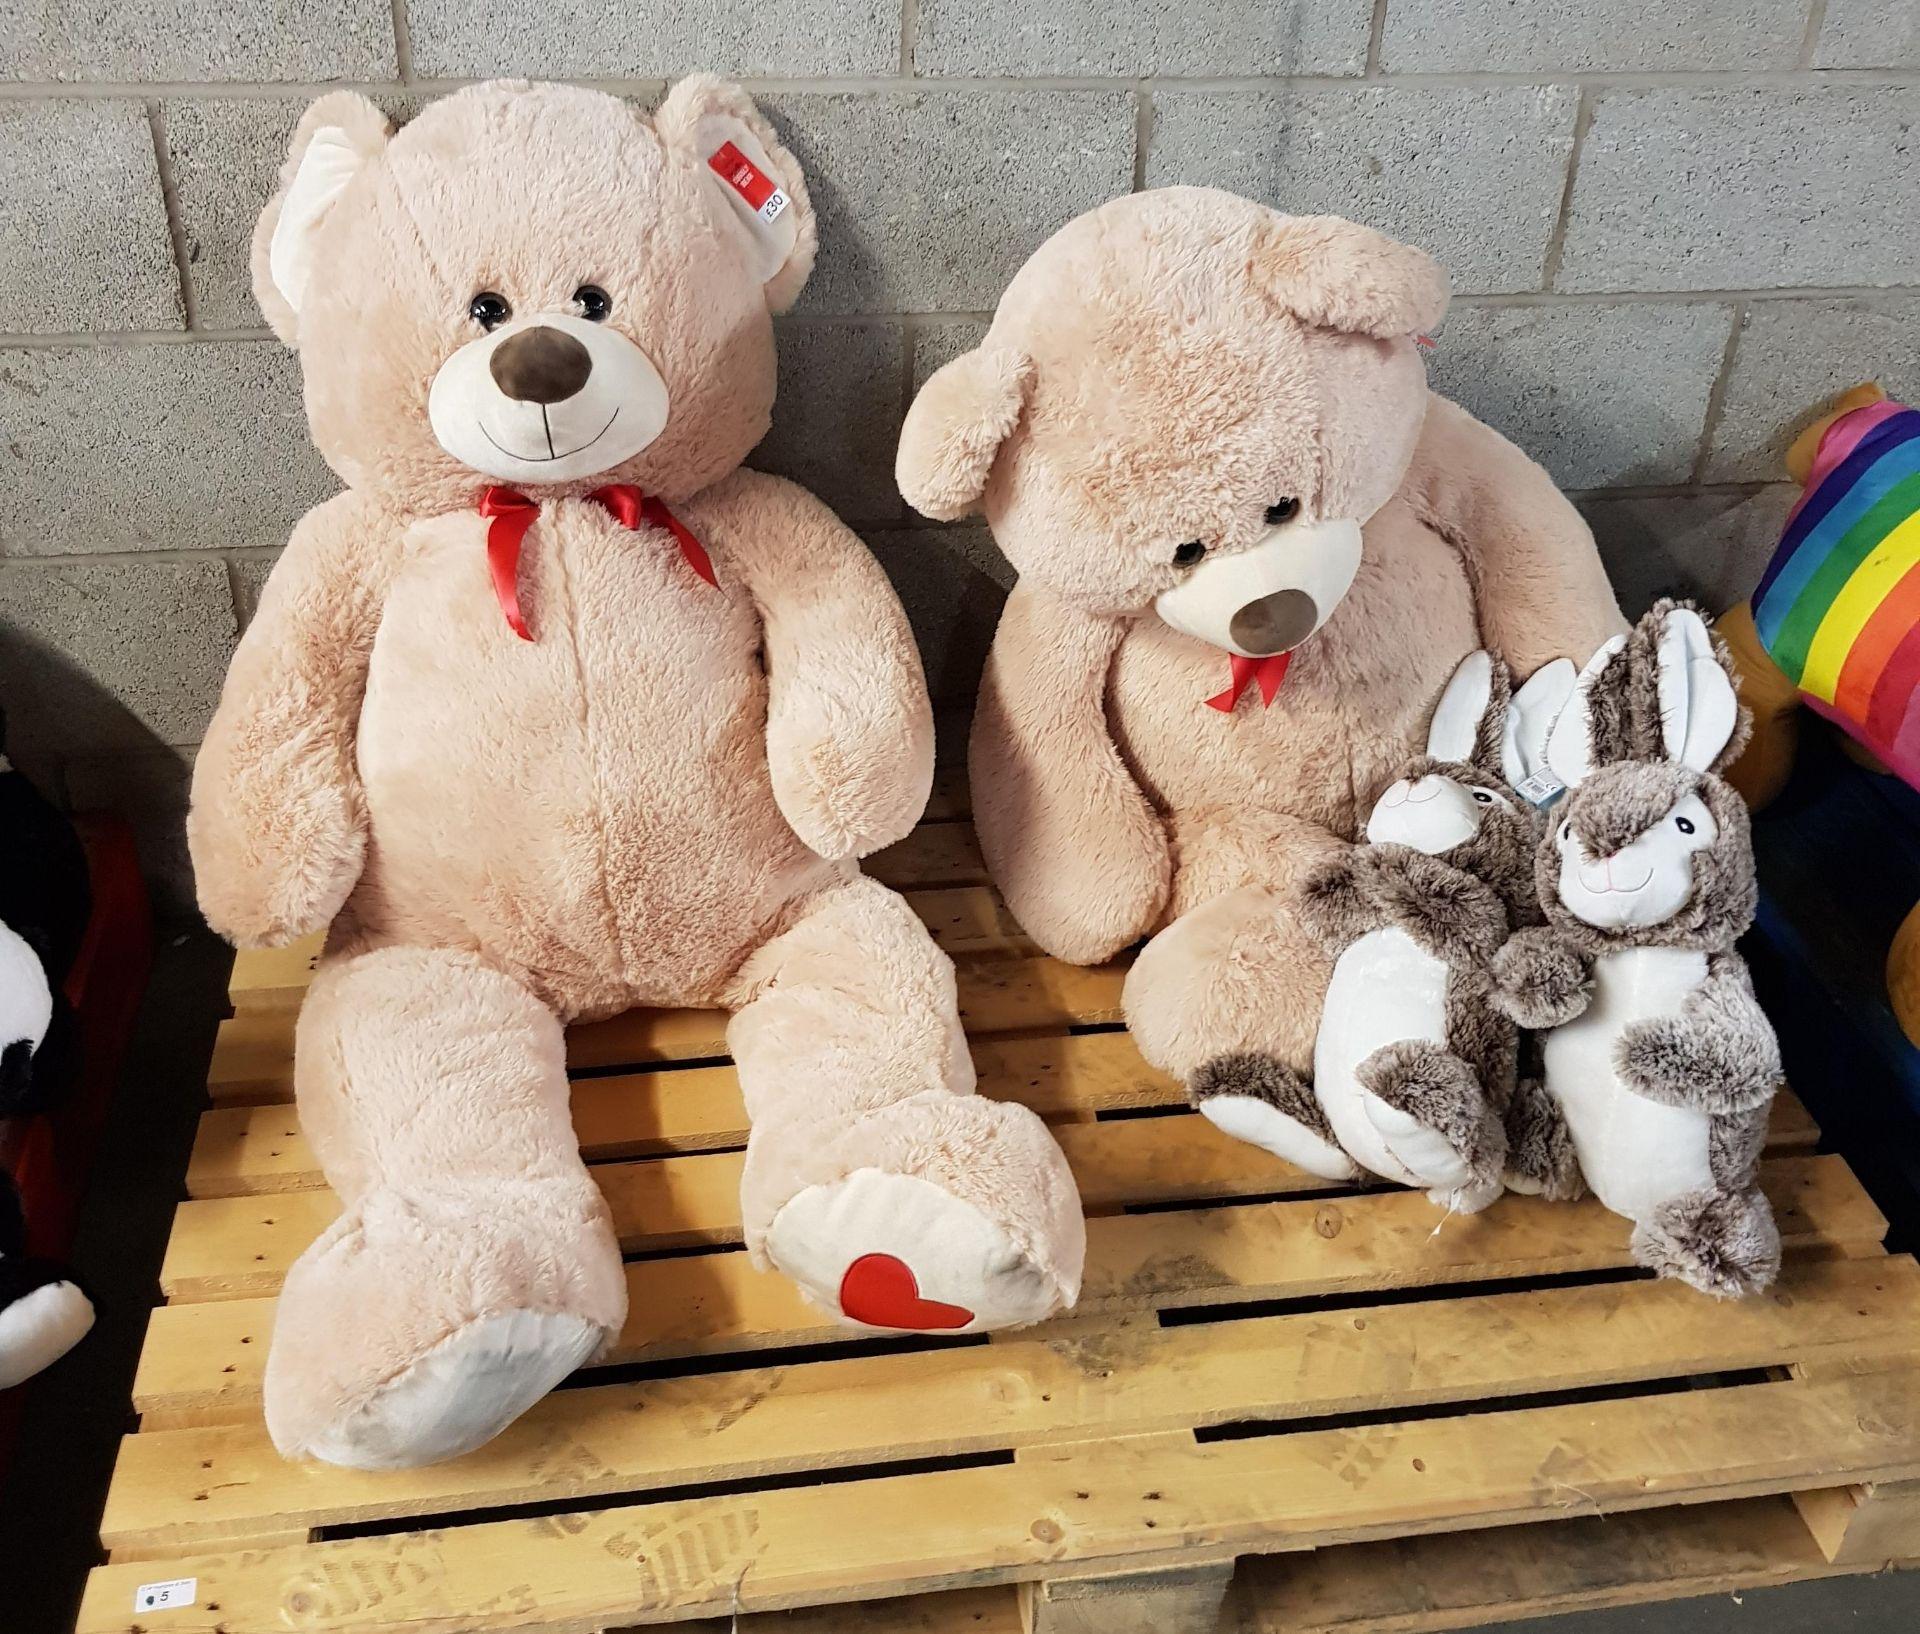 Lot 5 - 4 ITEMS - 2 x GIANT TEDDY BEARS & 2 x SOFT RABBITS